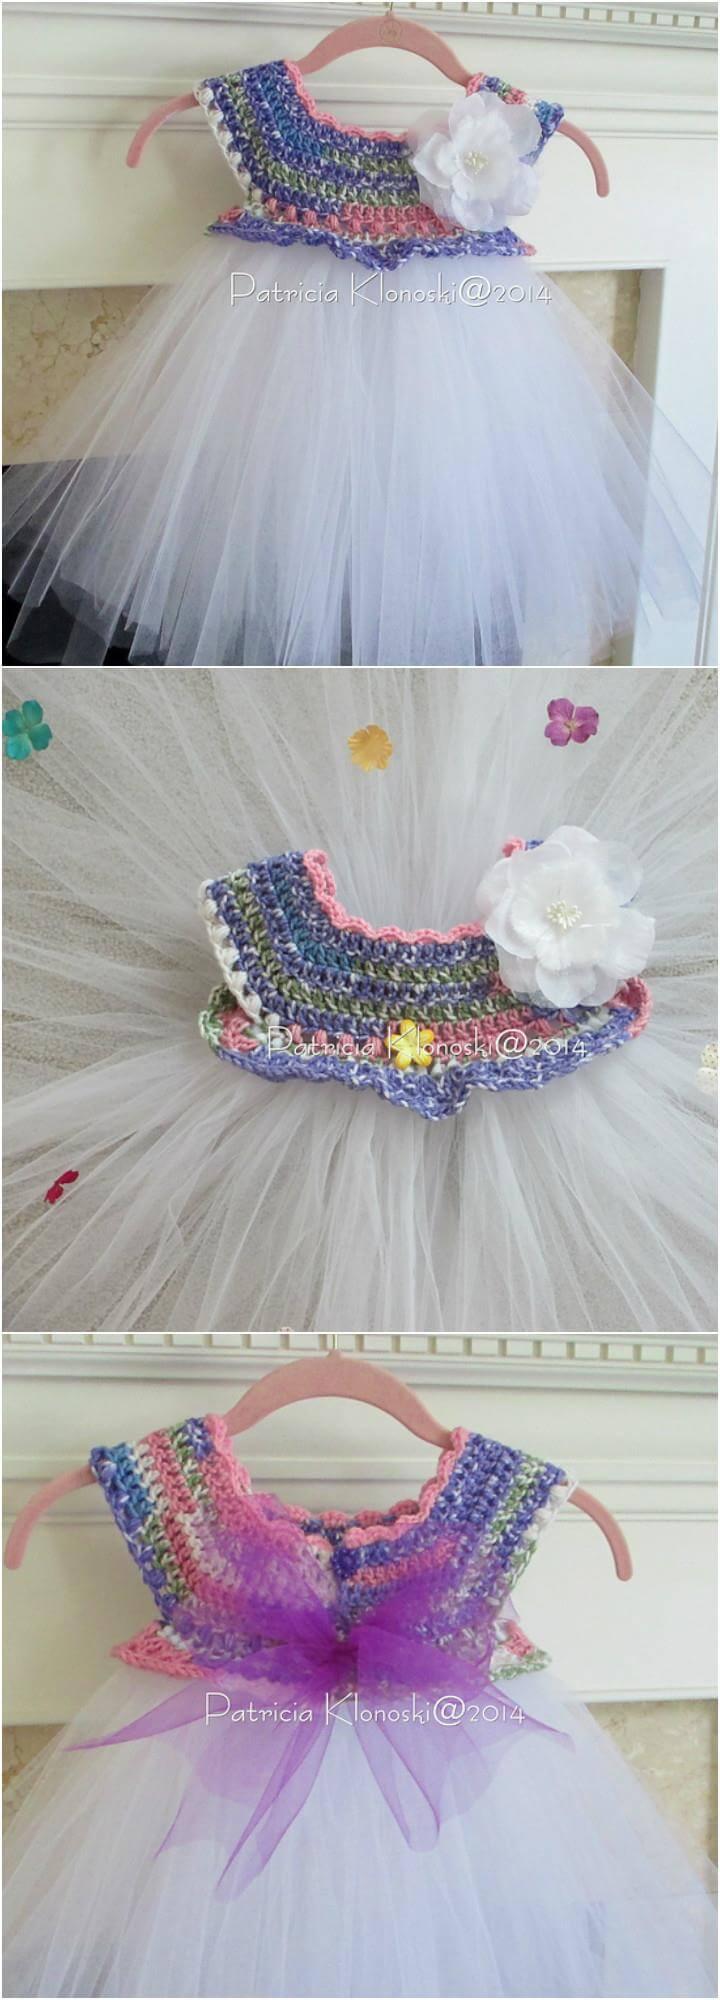 Free Crochet Tulle Dress Pattern : 10 Free Crochet Patterns for Girl Tutu Dress Top 101 Crochet